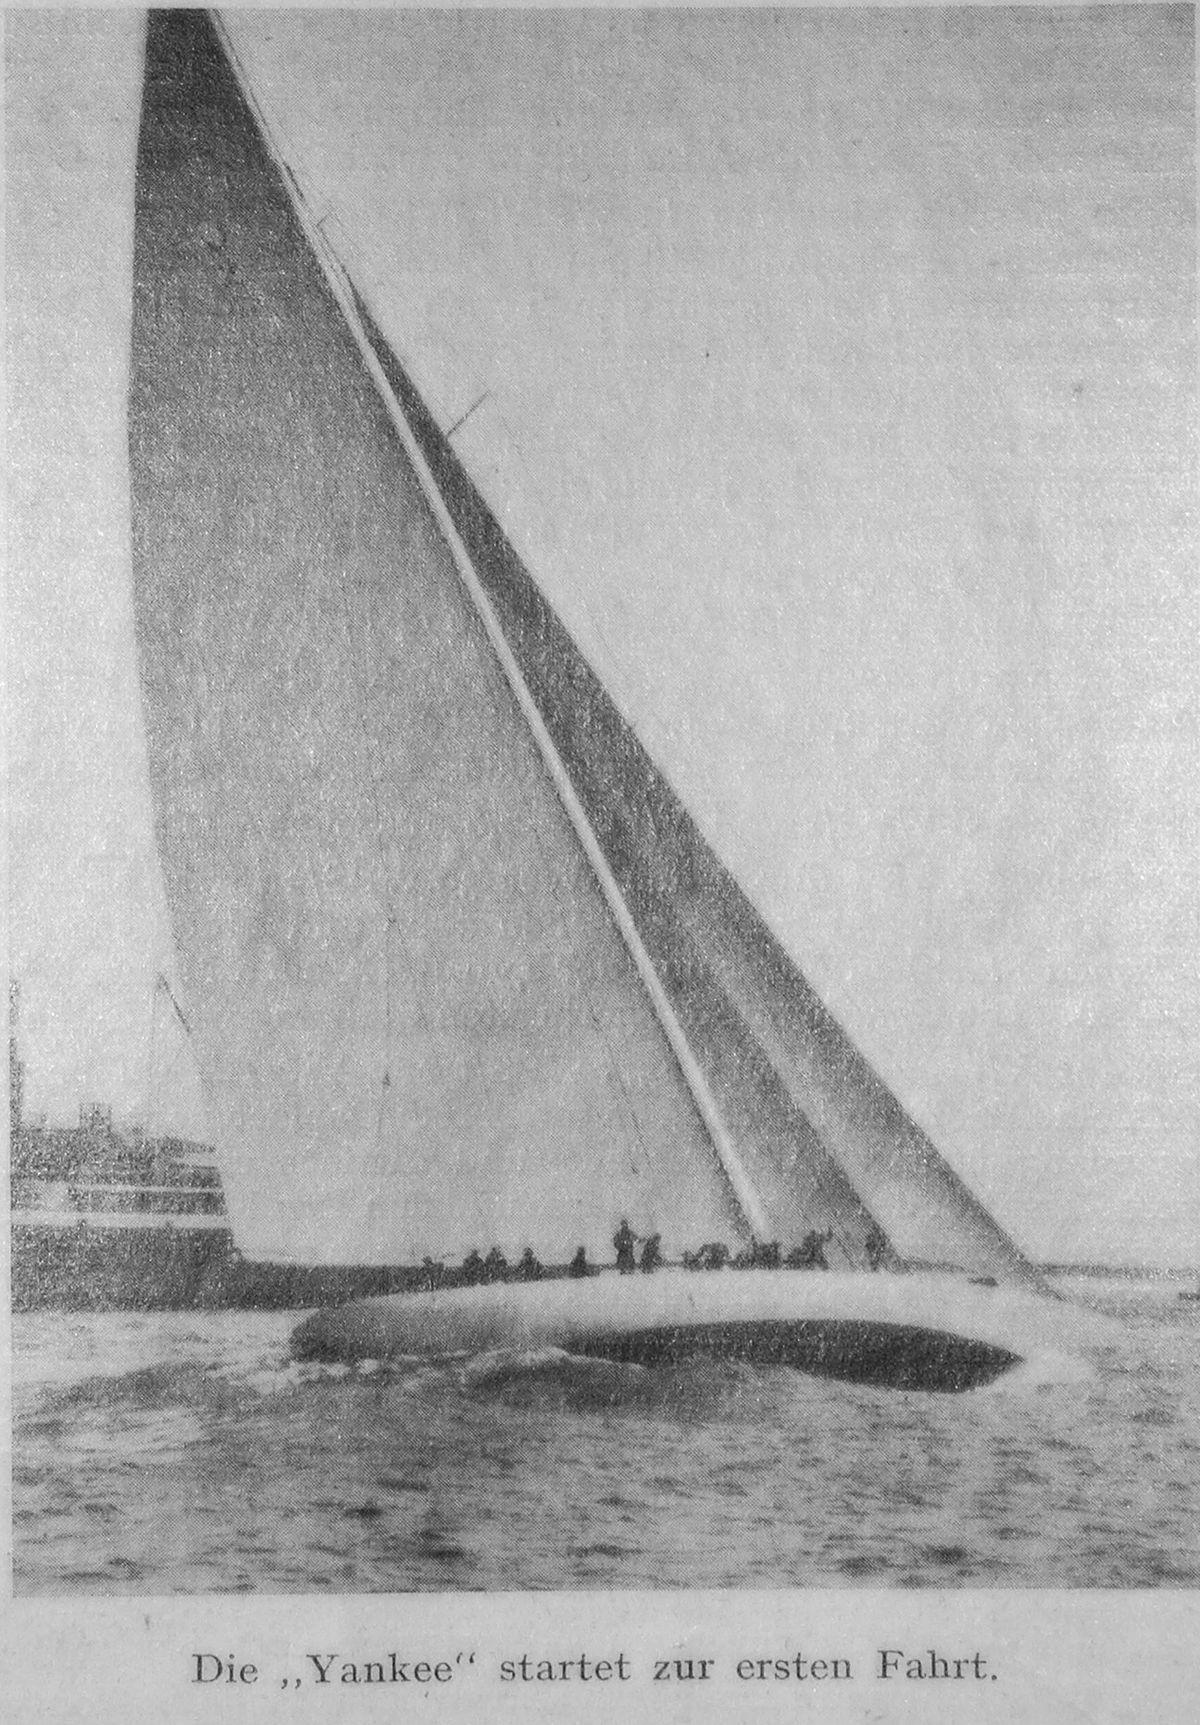 Yankee Yacht Wikipedia